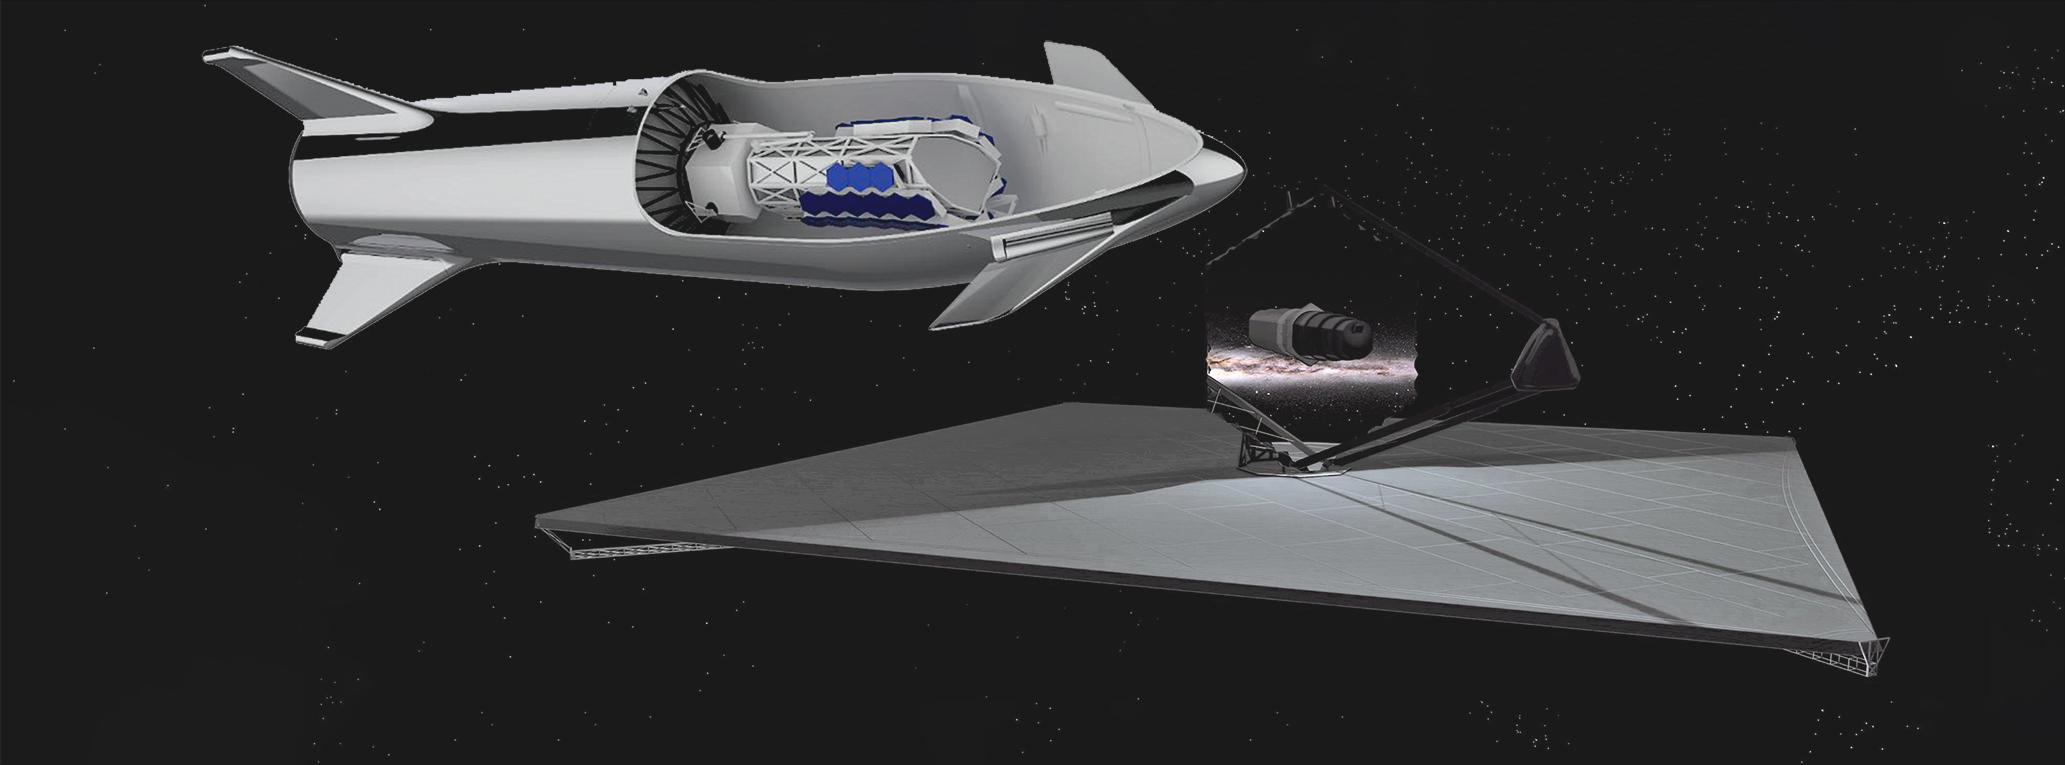 Starship NASA LUVOIR A and B space telescopes (SpaceX – NASA) 1